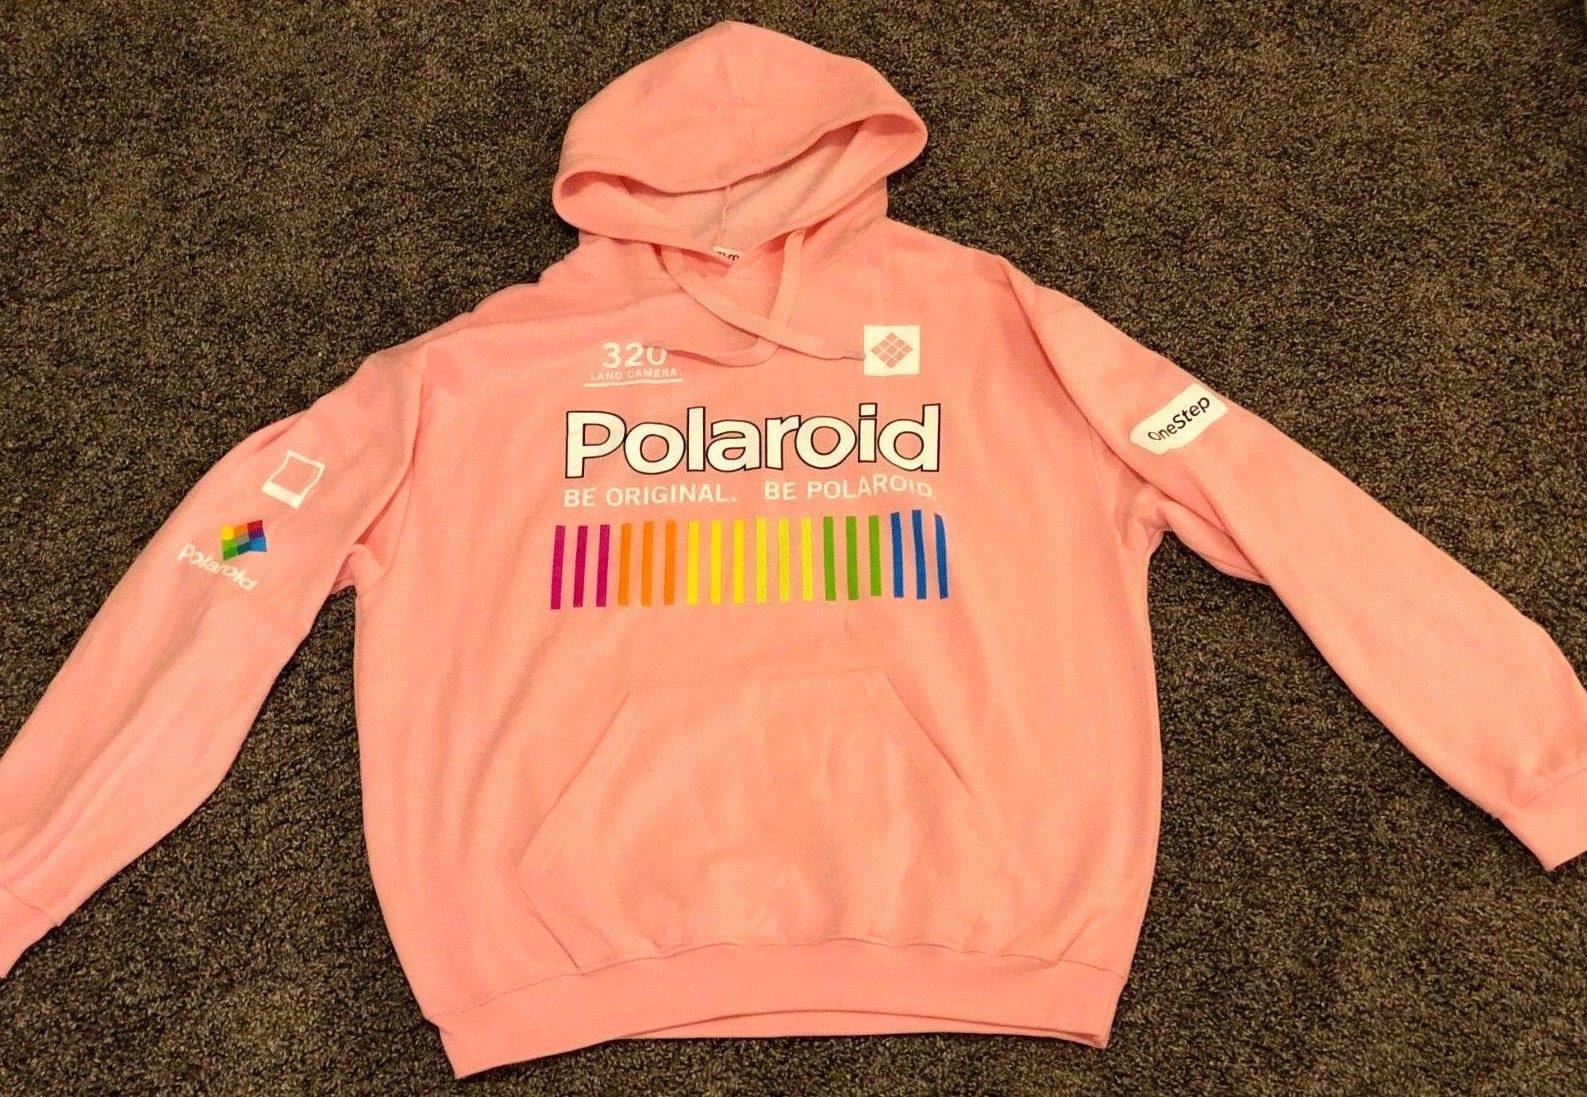 50dbbacbb2 POLAROID Vintage Retro Vaporwave Pink Rainbow Design Onestep Hoodie - LARGE